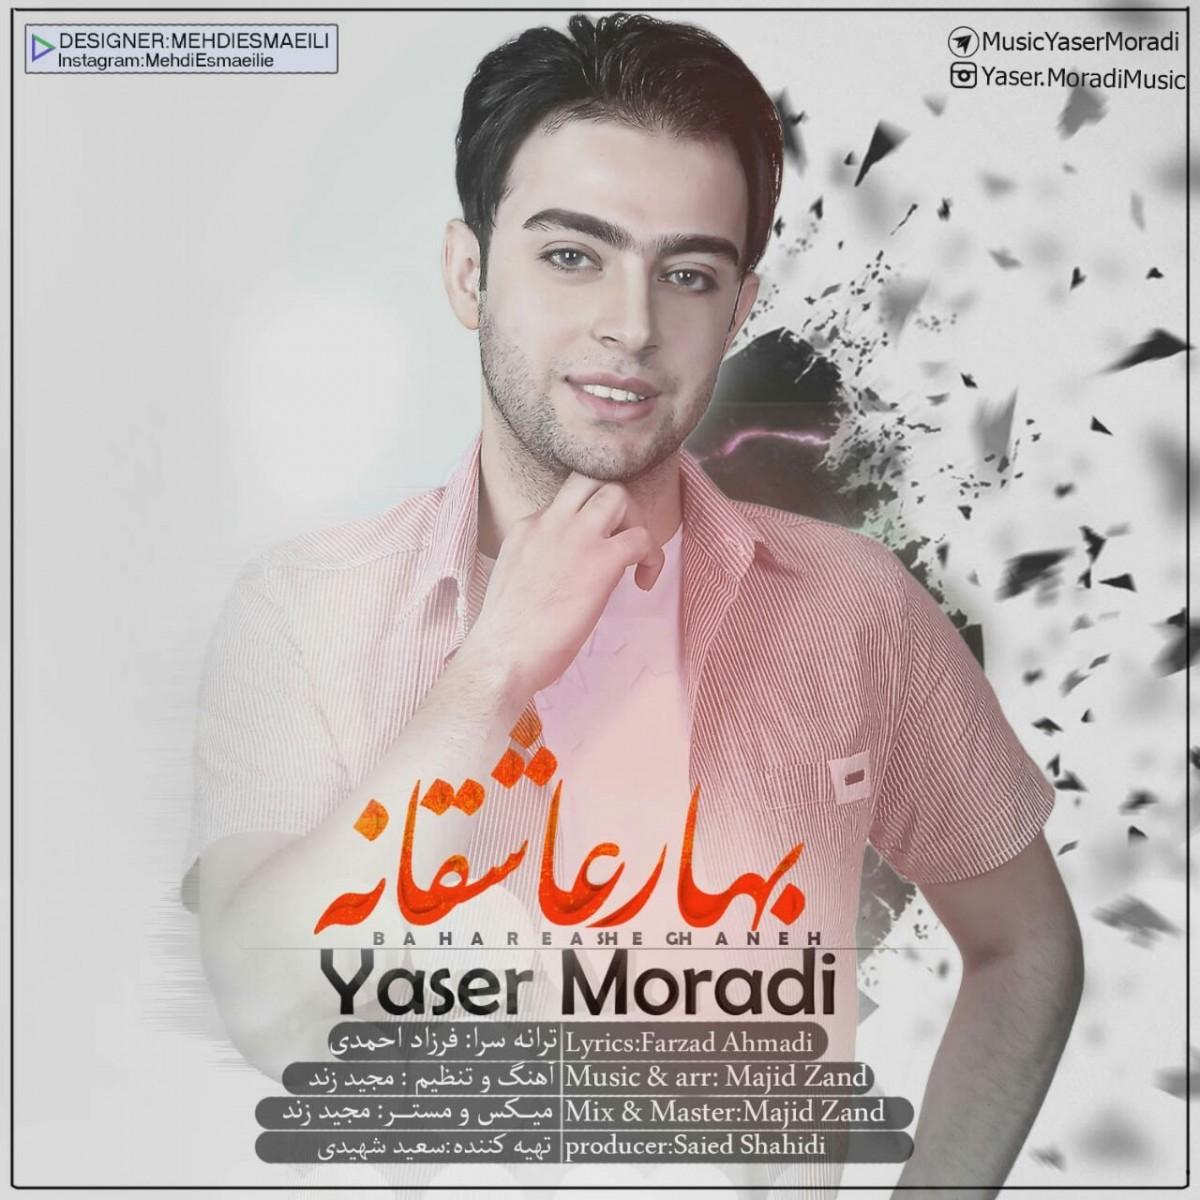 نامبر وان موزیک | دانلود آهنگ جدید Yaser-Moradi-Bahare-Asheghaneh